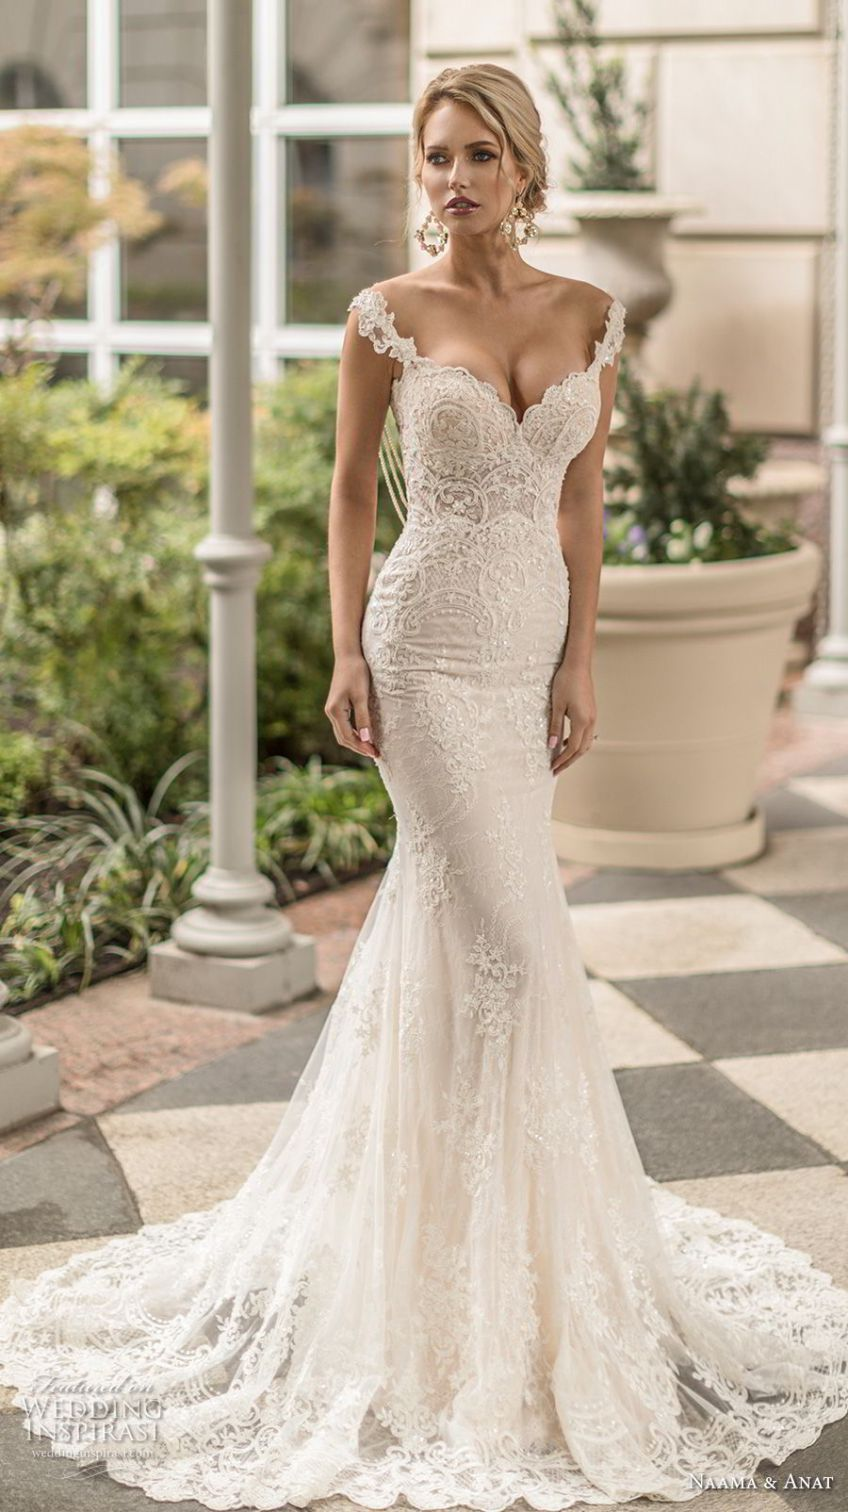 Naama Anat Spring 2019 Bridal Sleeveless Embellished Strap Sweetheart Neck Bridal Dresses Lace Wedding Dresses Mermaid Sweetheart Lace Sweetheart Wedding Dress [ 1512 x 848 Pixel ]